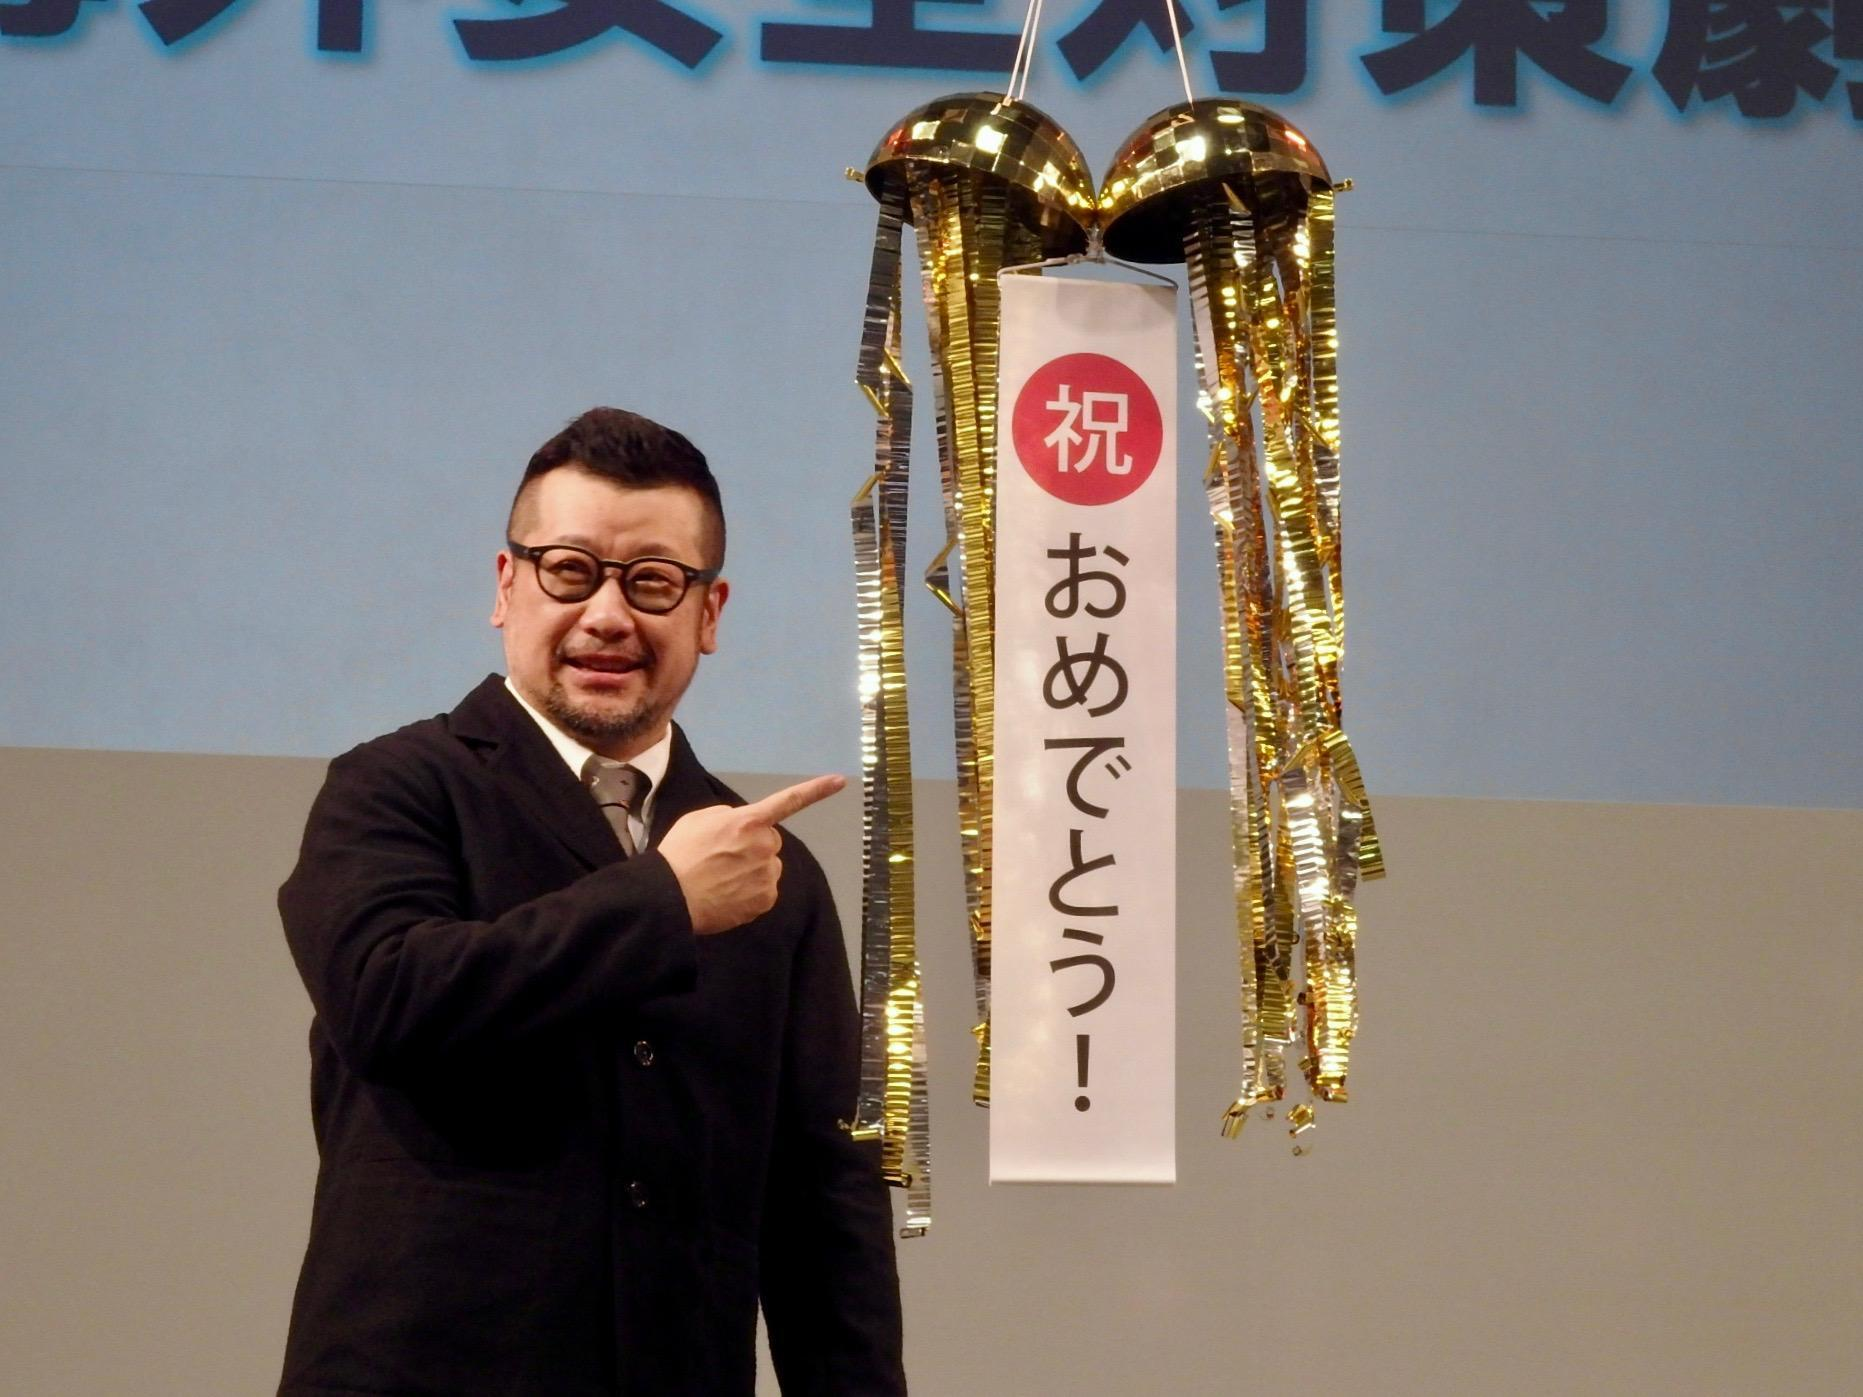 http://news.yoshimoto.co.jp/20180923160210-87108199c0adbf111ad28170a2f6dcc32417e861.jpg